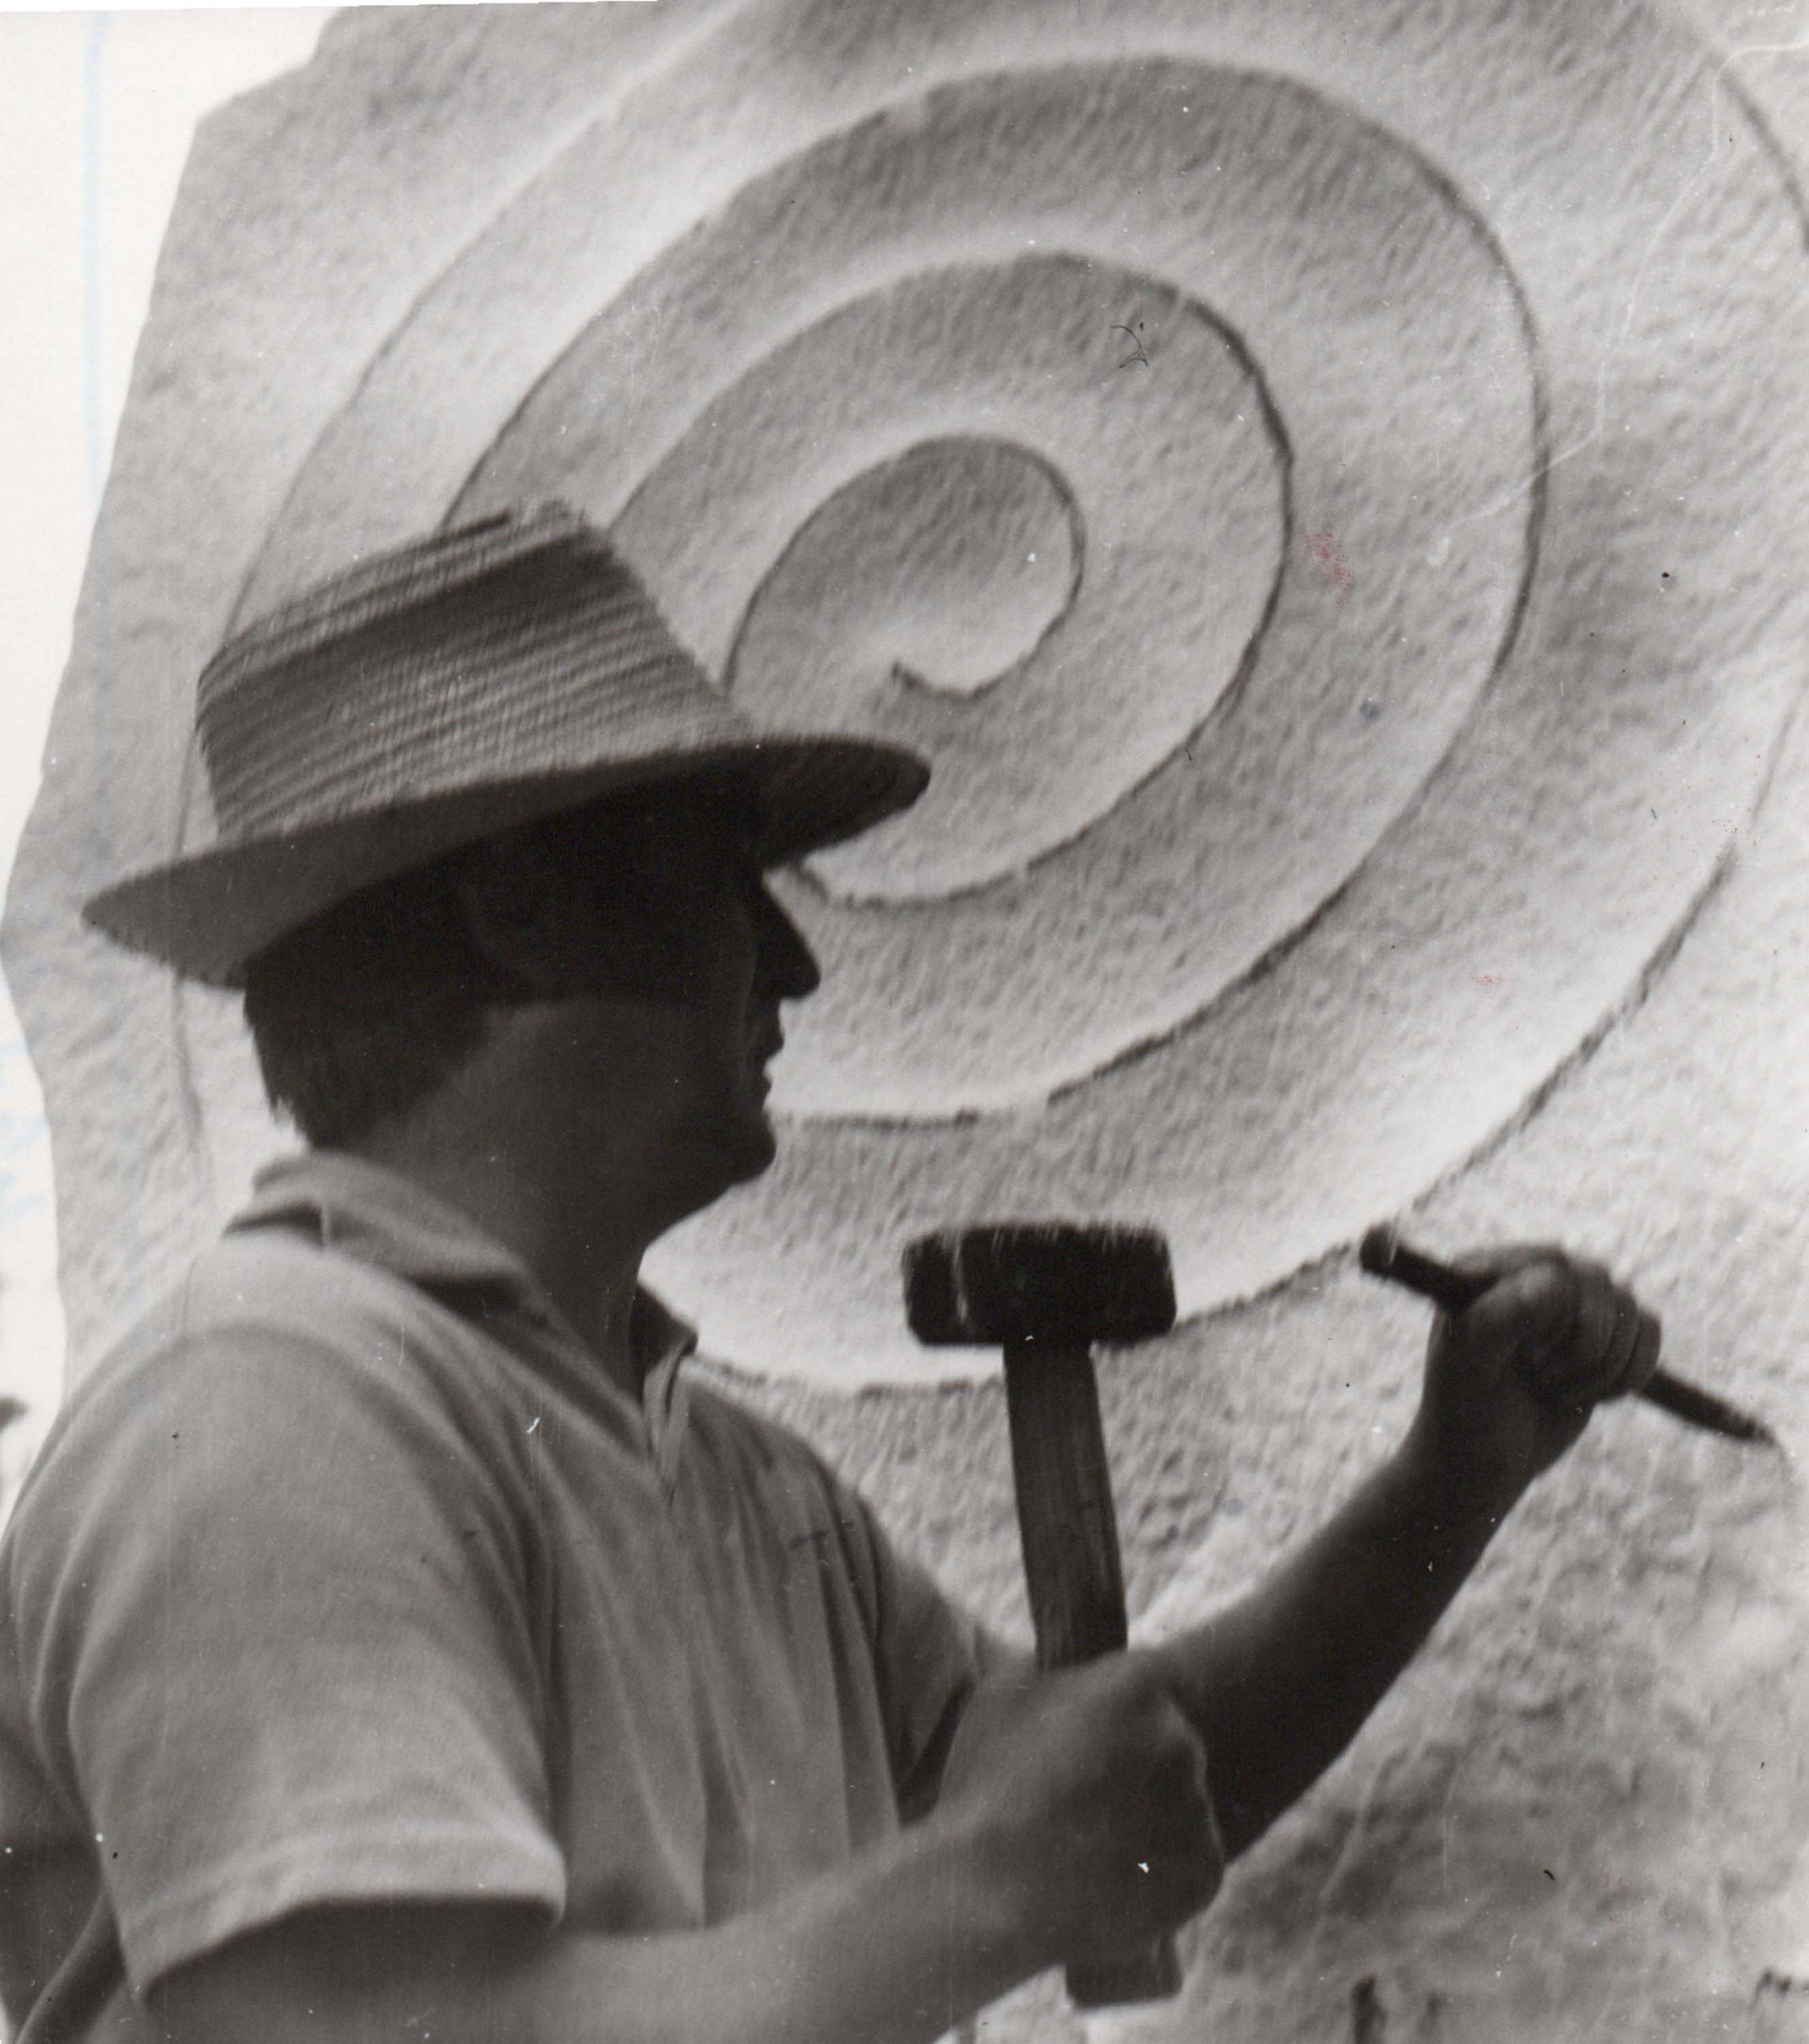 Janez Lenassi, Jugo, 1972.